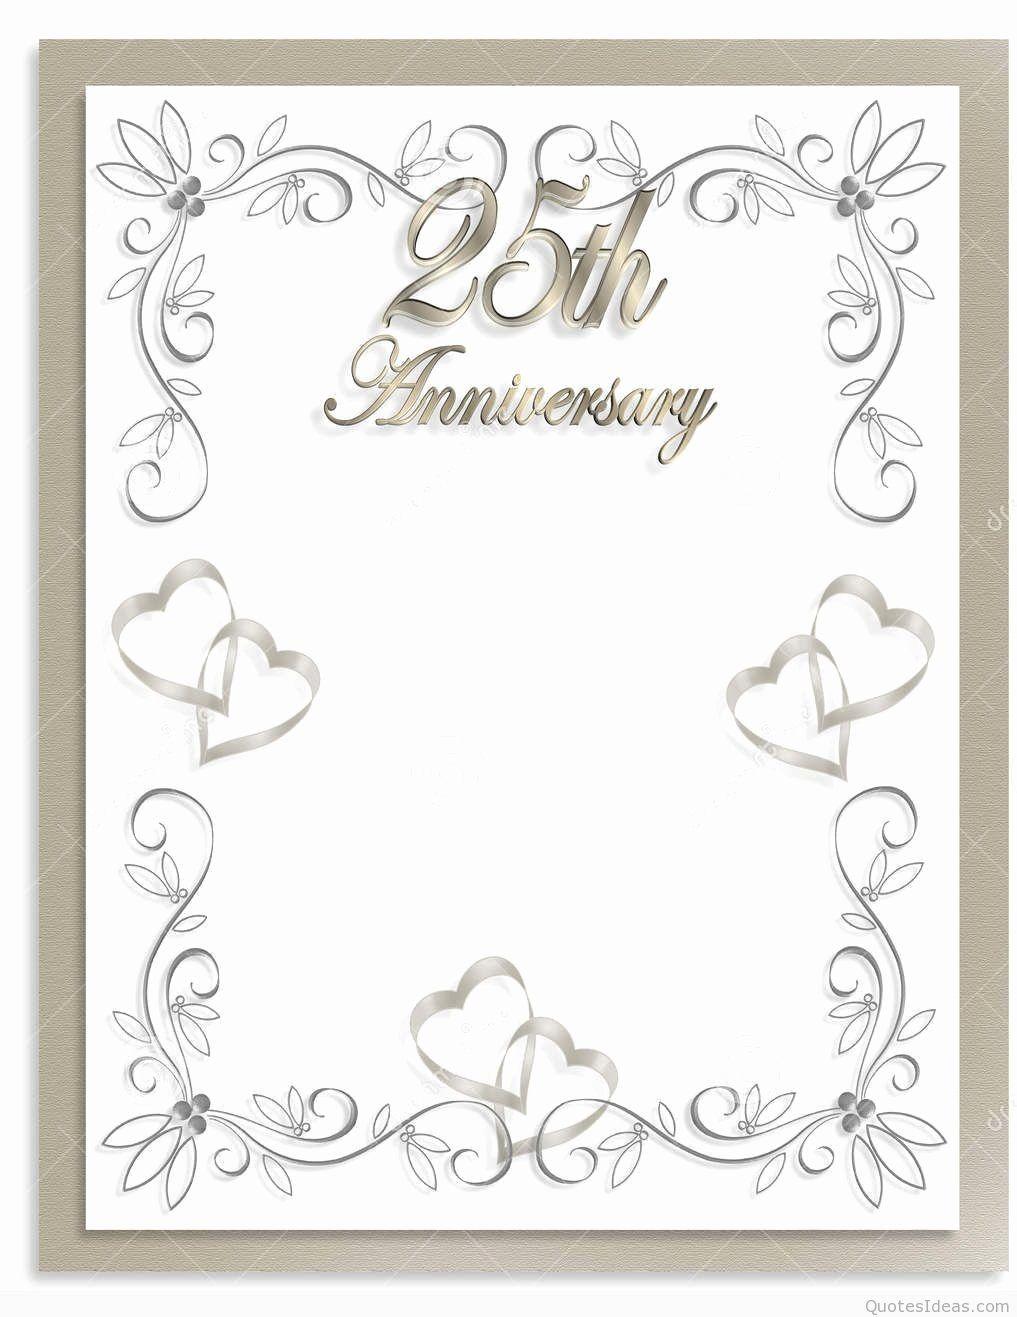 25th Wedding Anniversary Invitations Templates Unique 50th Wedding Anniversary Invitations 25th Wedding Anniversary Invitations Wedding Anniversary Invitations